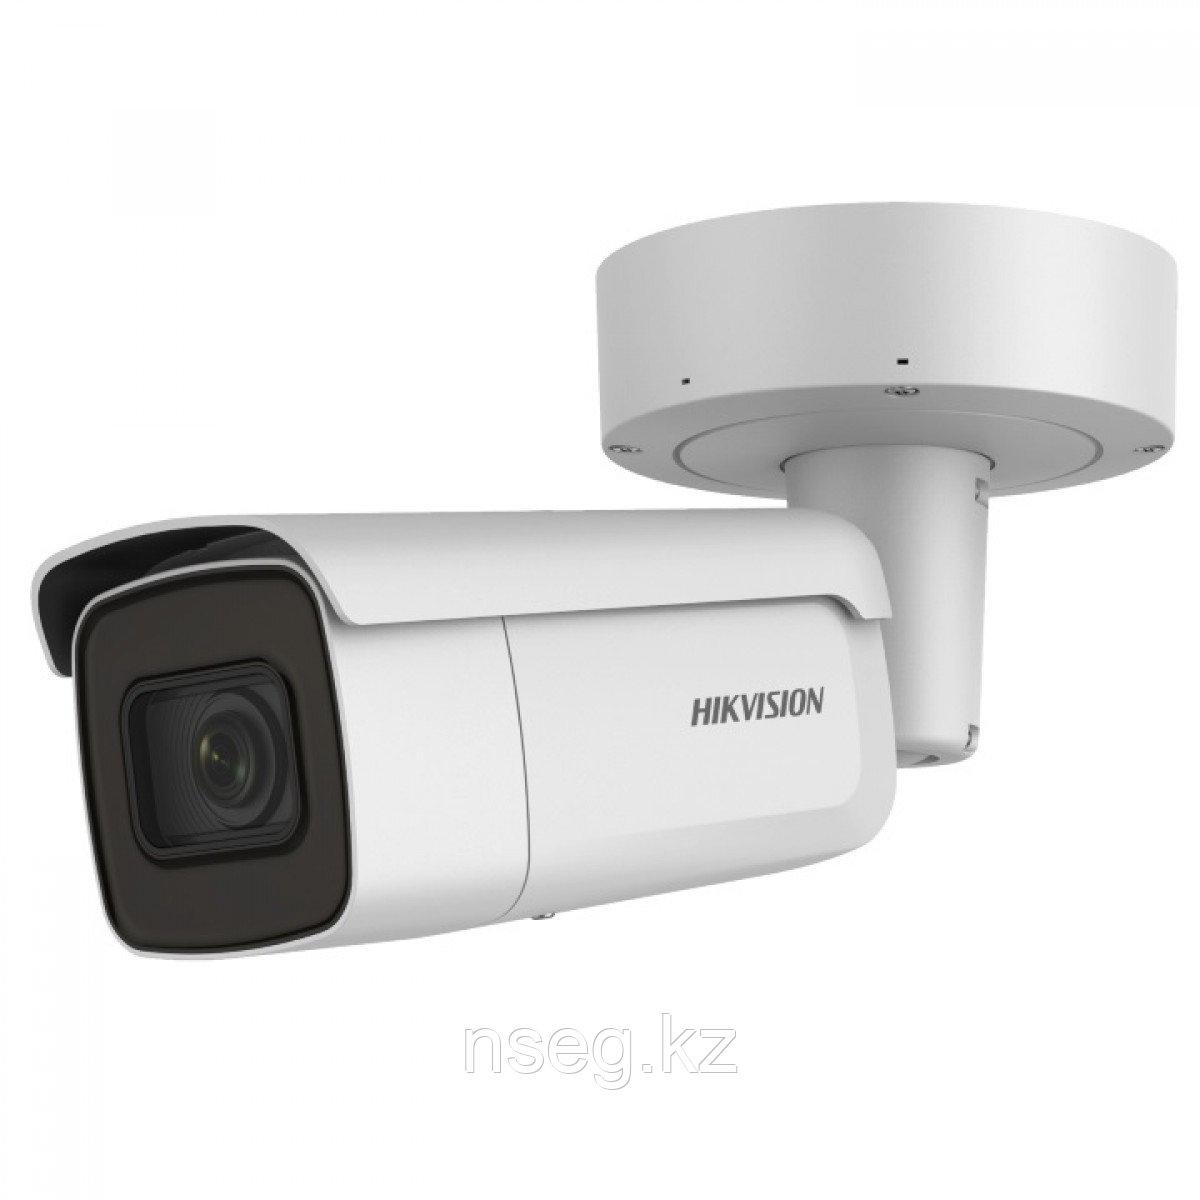 HIKVISION DS-2CD2655FWD-IZ IP камера